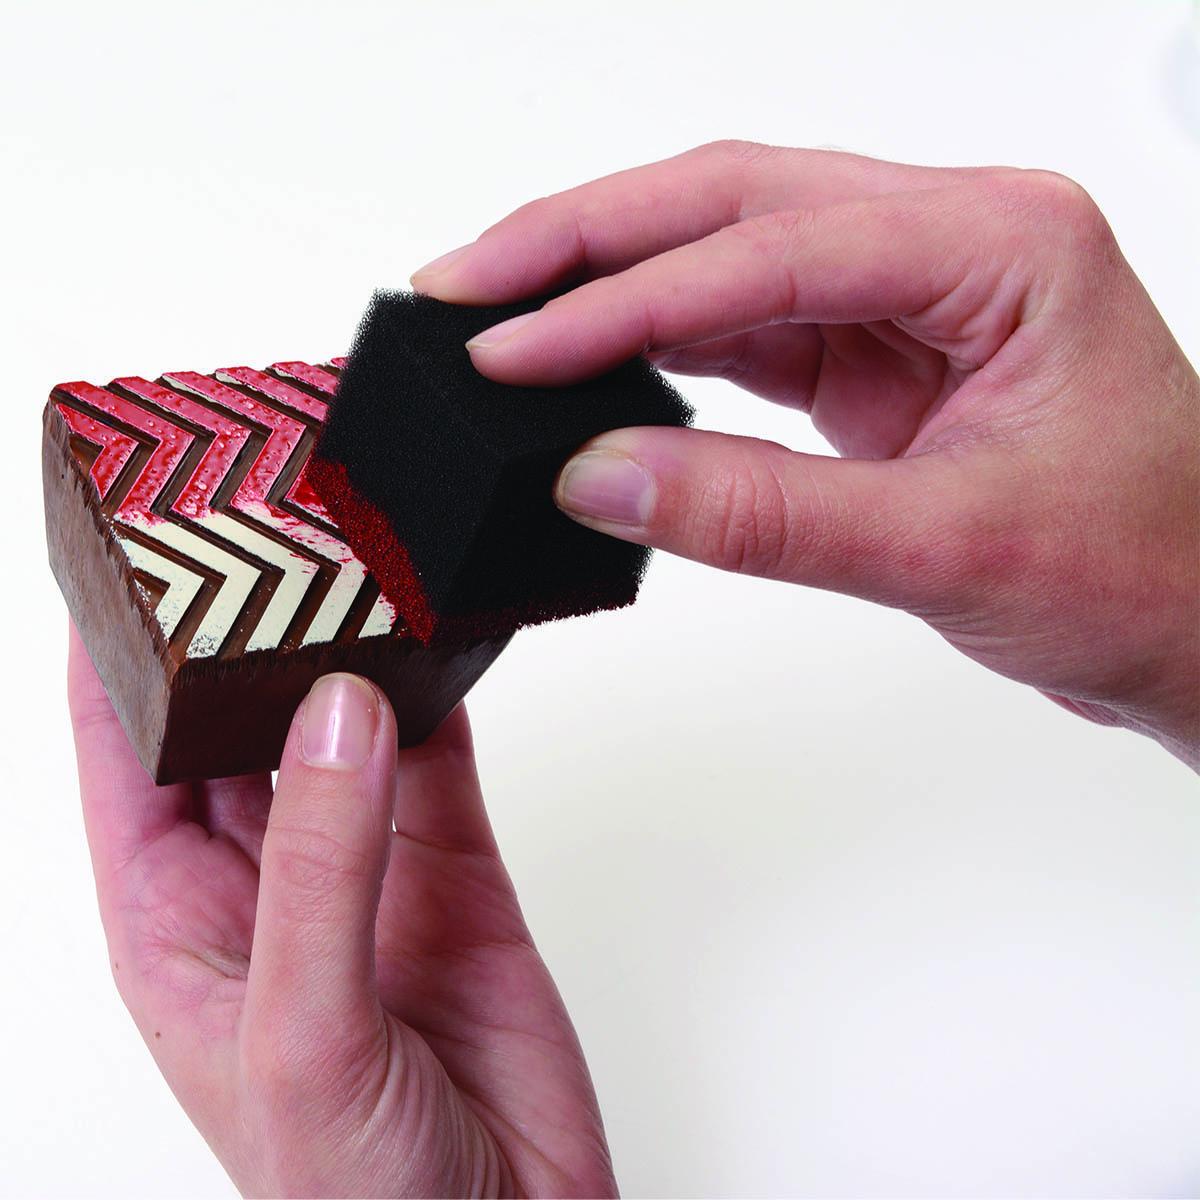 Fabric Creations™ Tools - Sponge Cubes